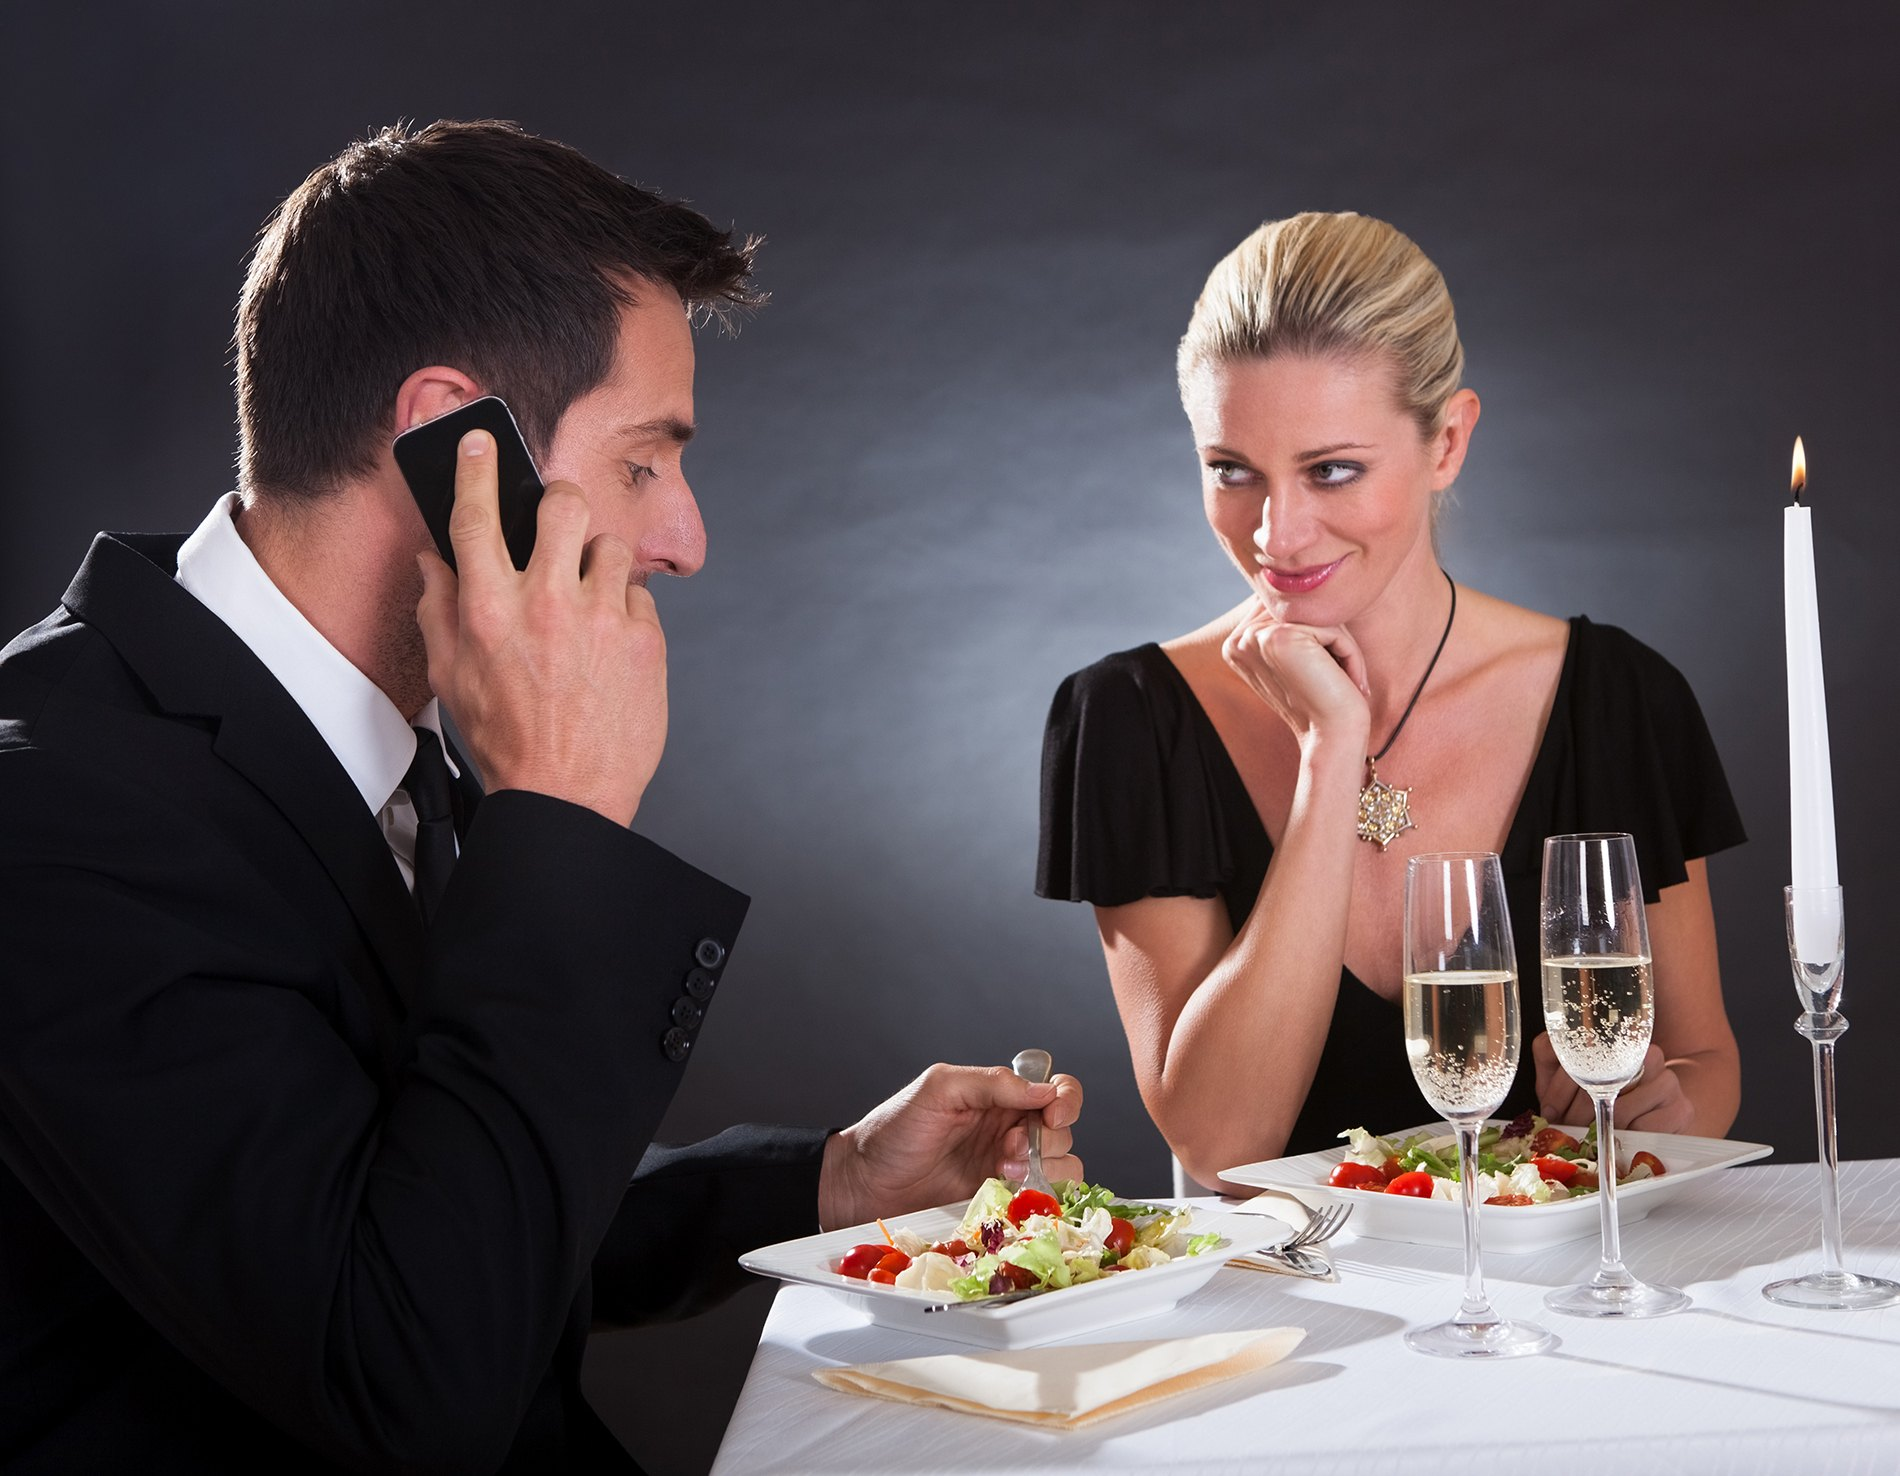 Galateo 34 regole da seguire a tavola agrodolce - Regole del galateo a tavola ...